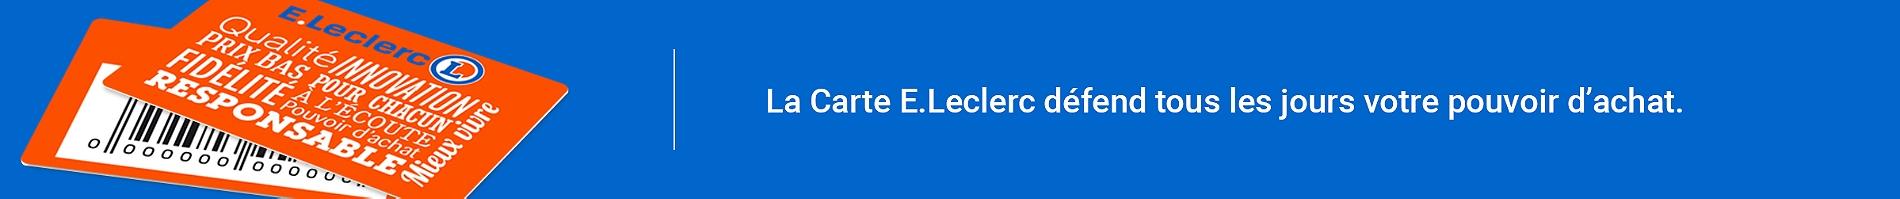 Carte De Fidelite E Leclerc